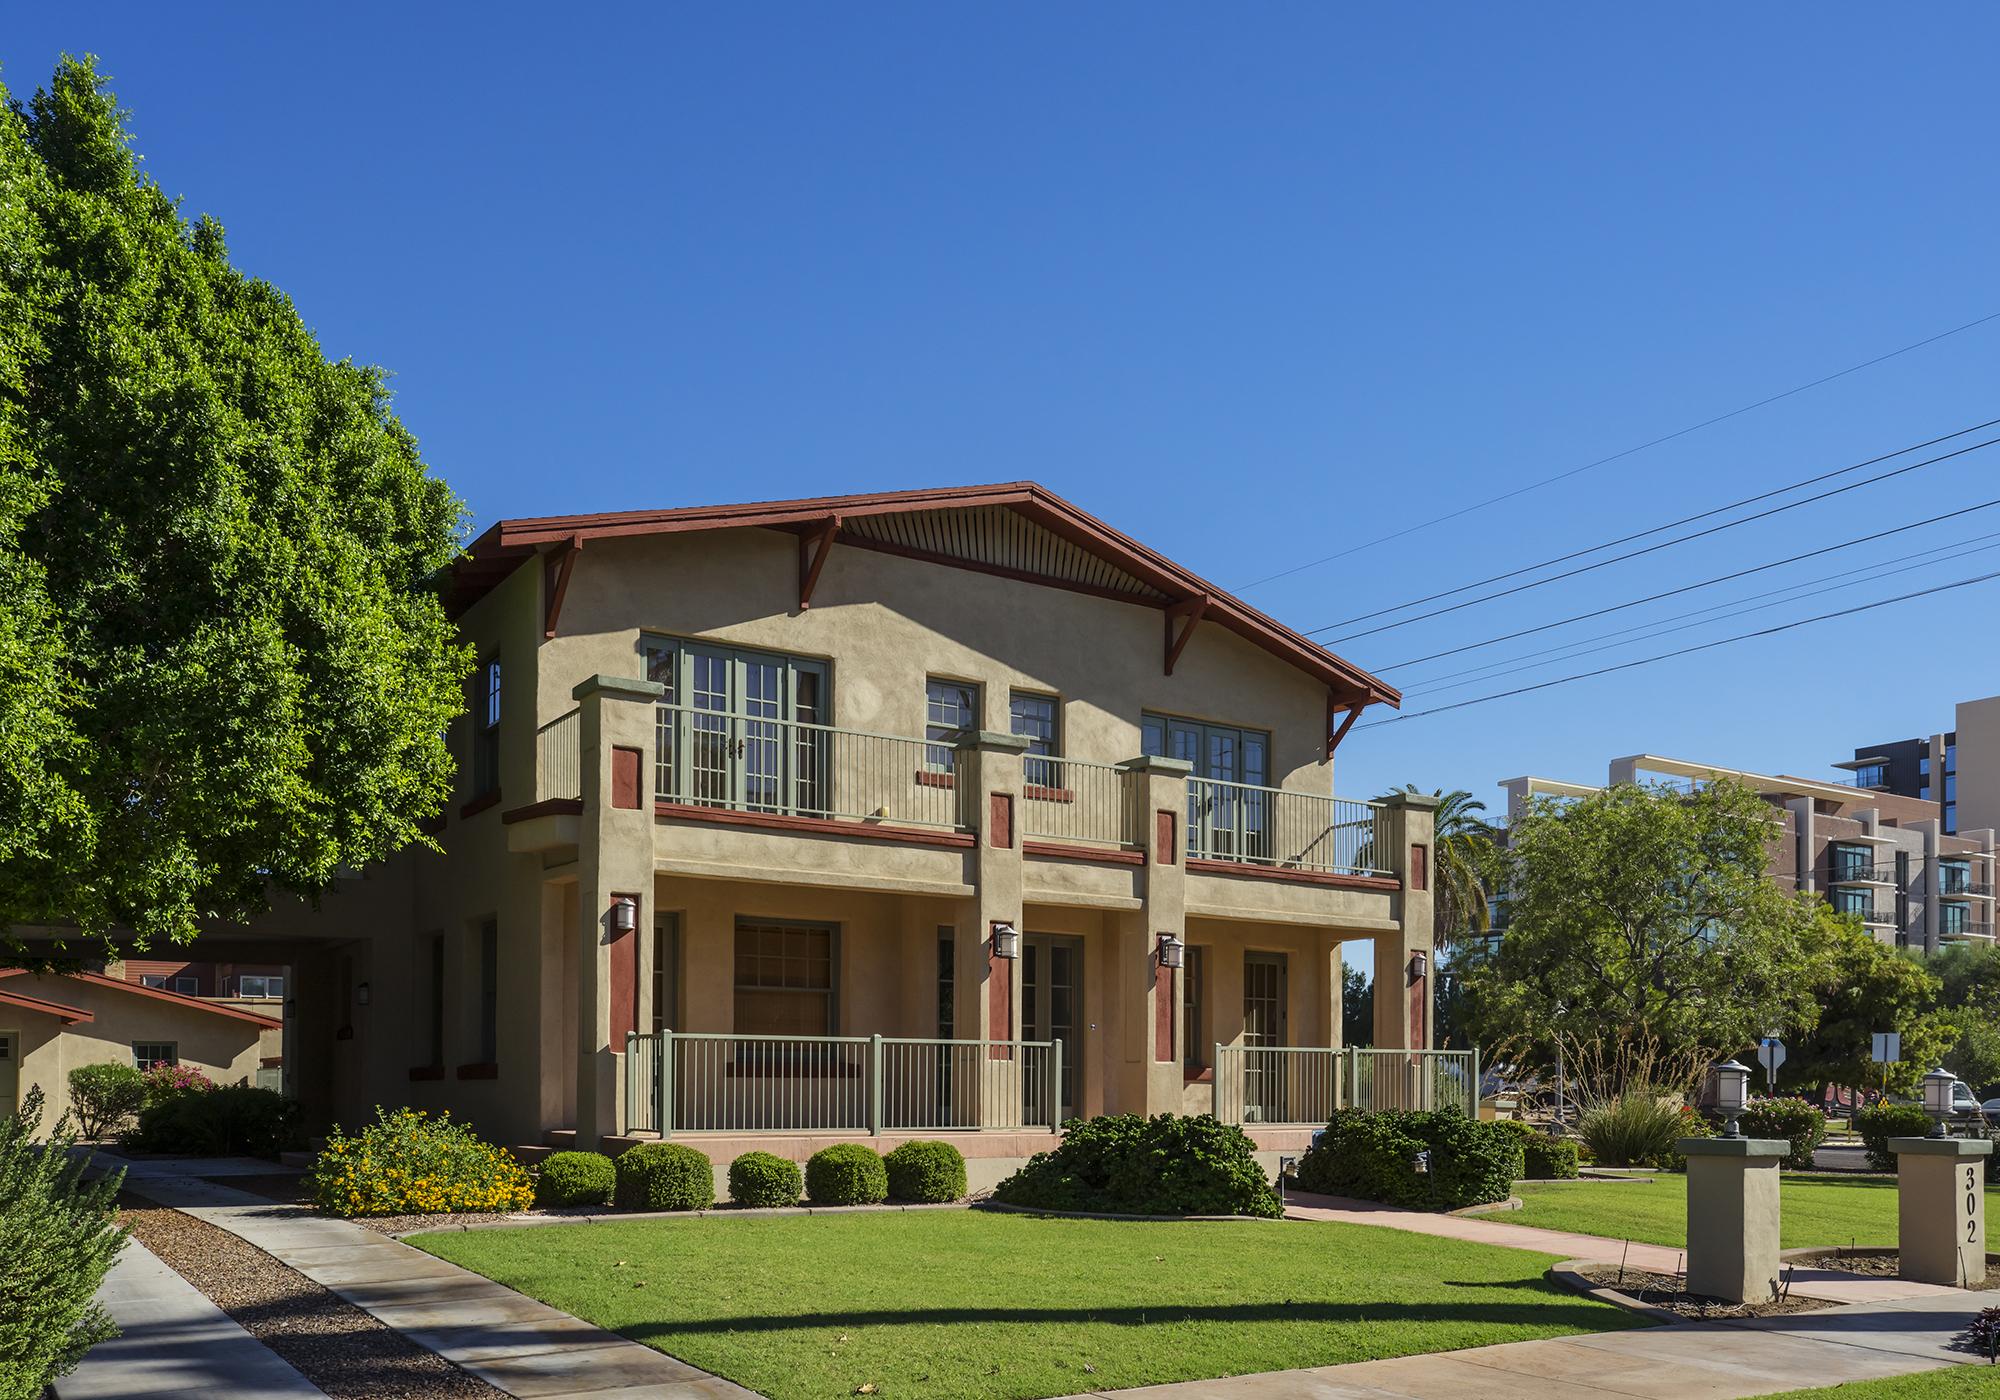 Sun Dee Residence_Exterior 2_HighRes.jpg